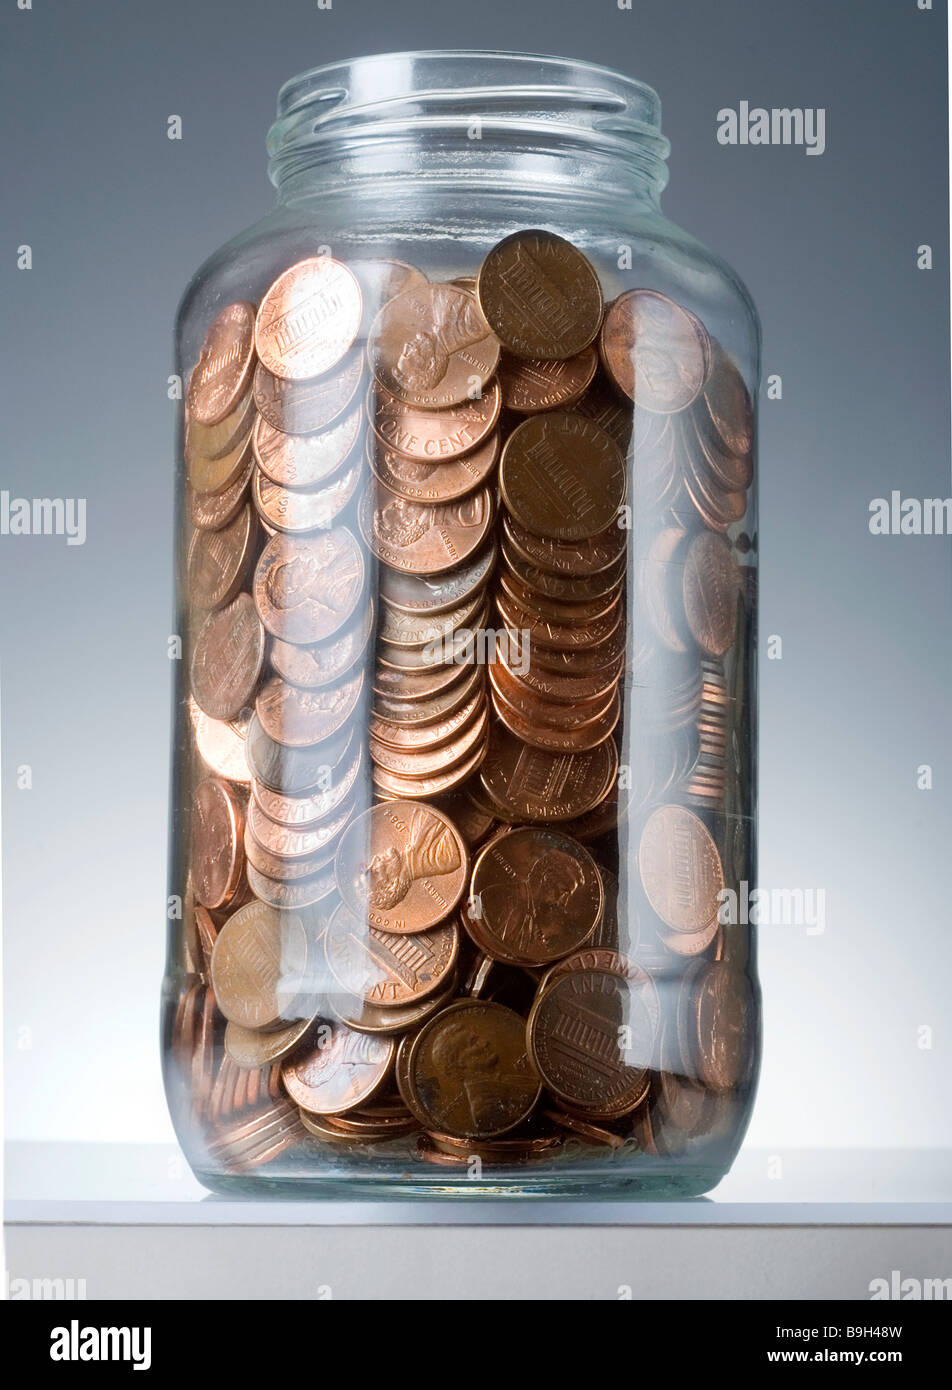 pennies - Stock Image